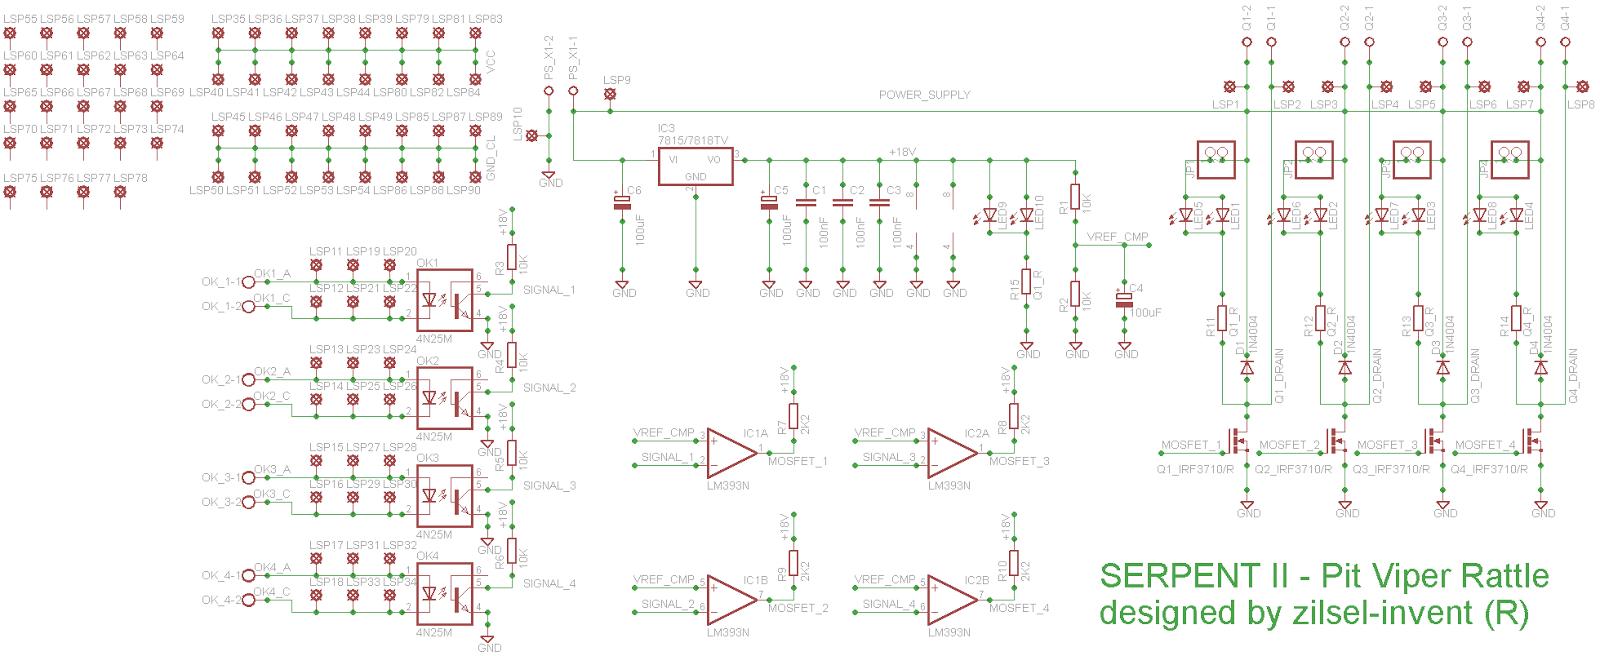 Serpent Ii Pit Viper Rattle Dc Motor Controller Diagram Image